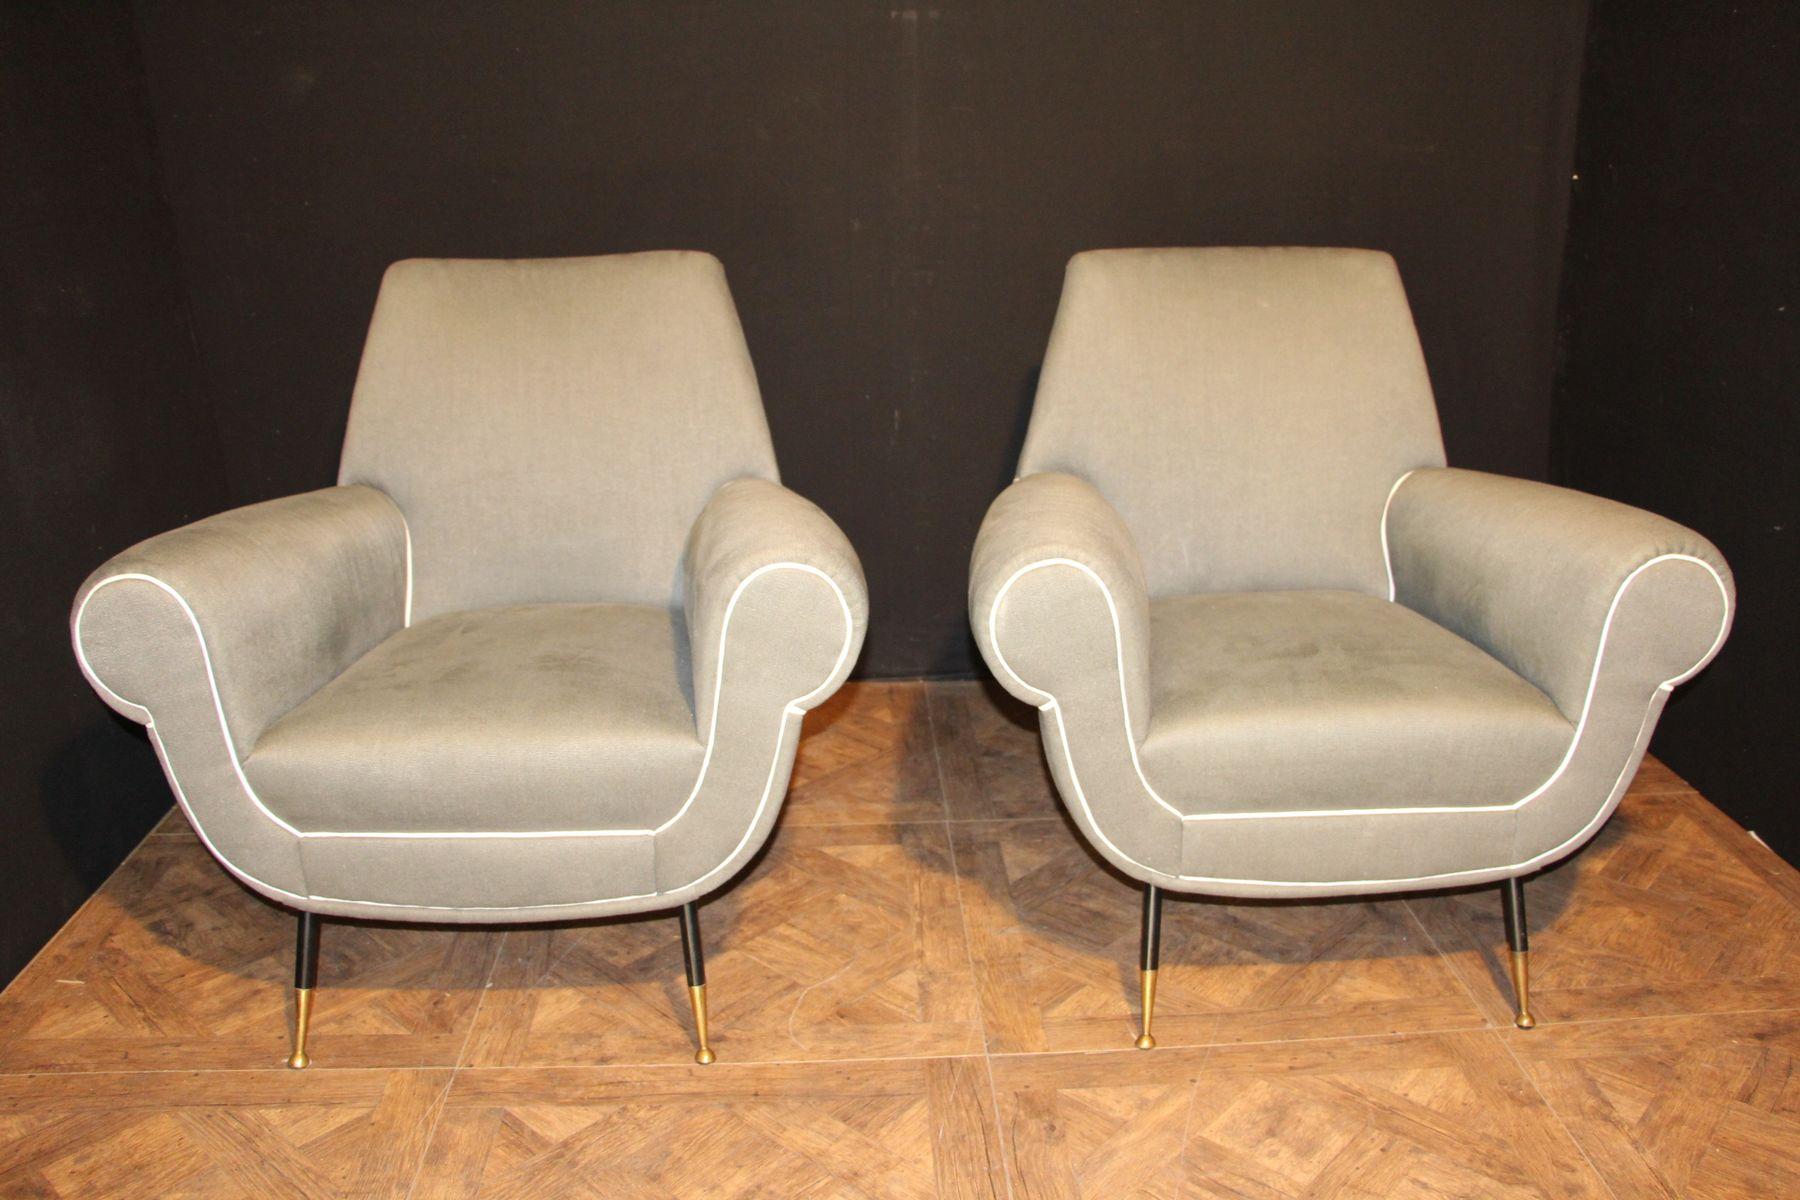 graue italienische sessel 1950er 2er set bei pamono kaufen. Black Bedroom Furniture Sets. Home Design Ideas